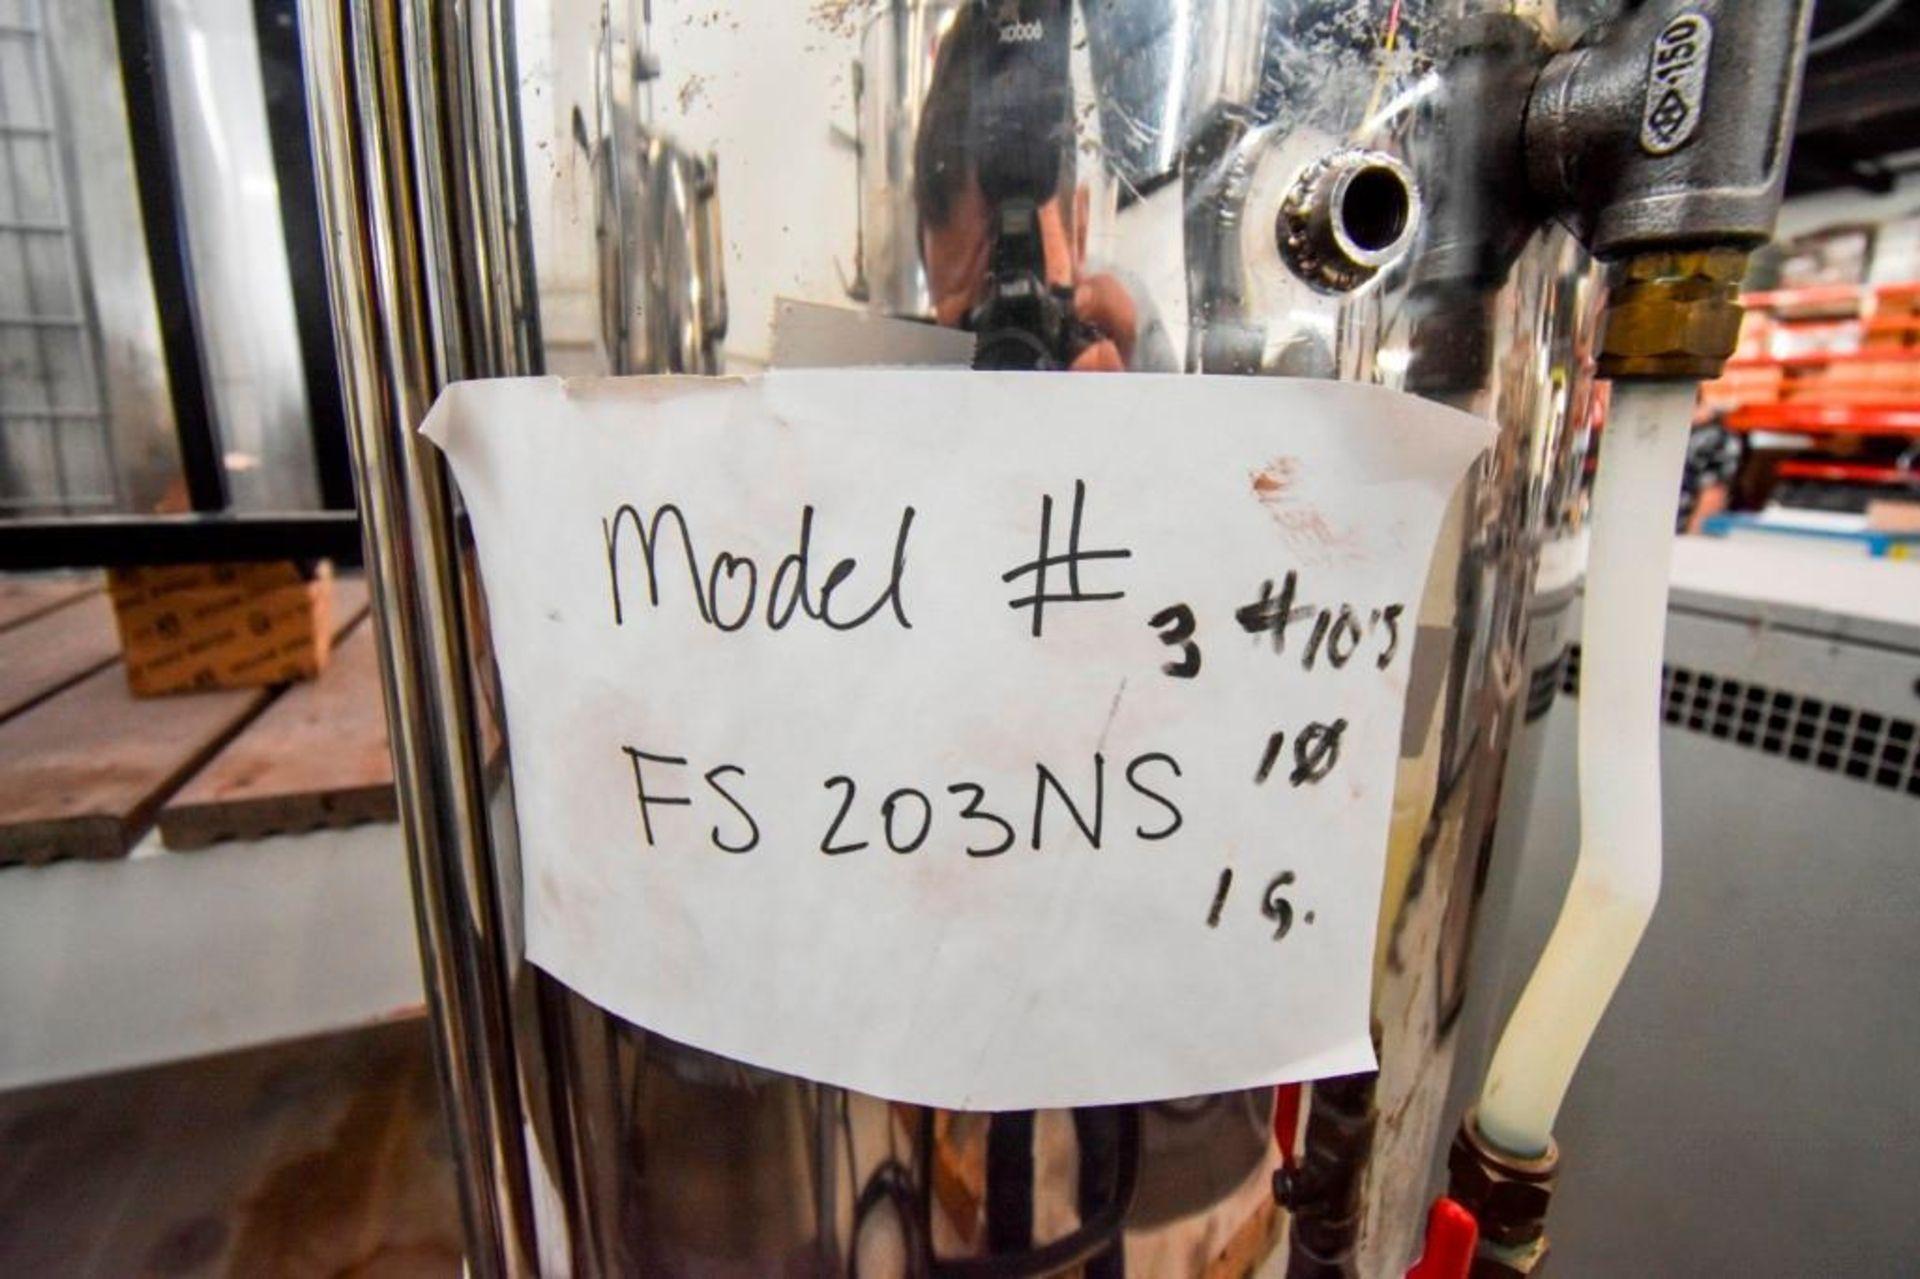 Yu Hao FS-203NS - Image 11 of 17